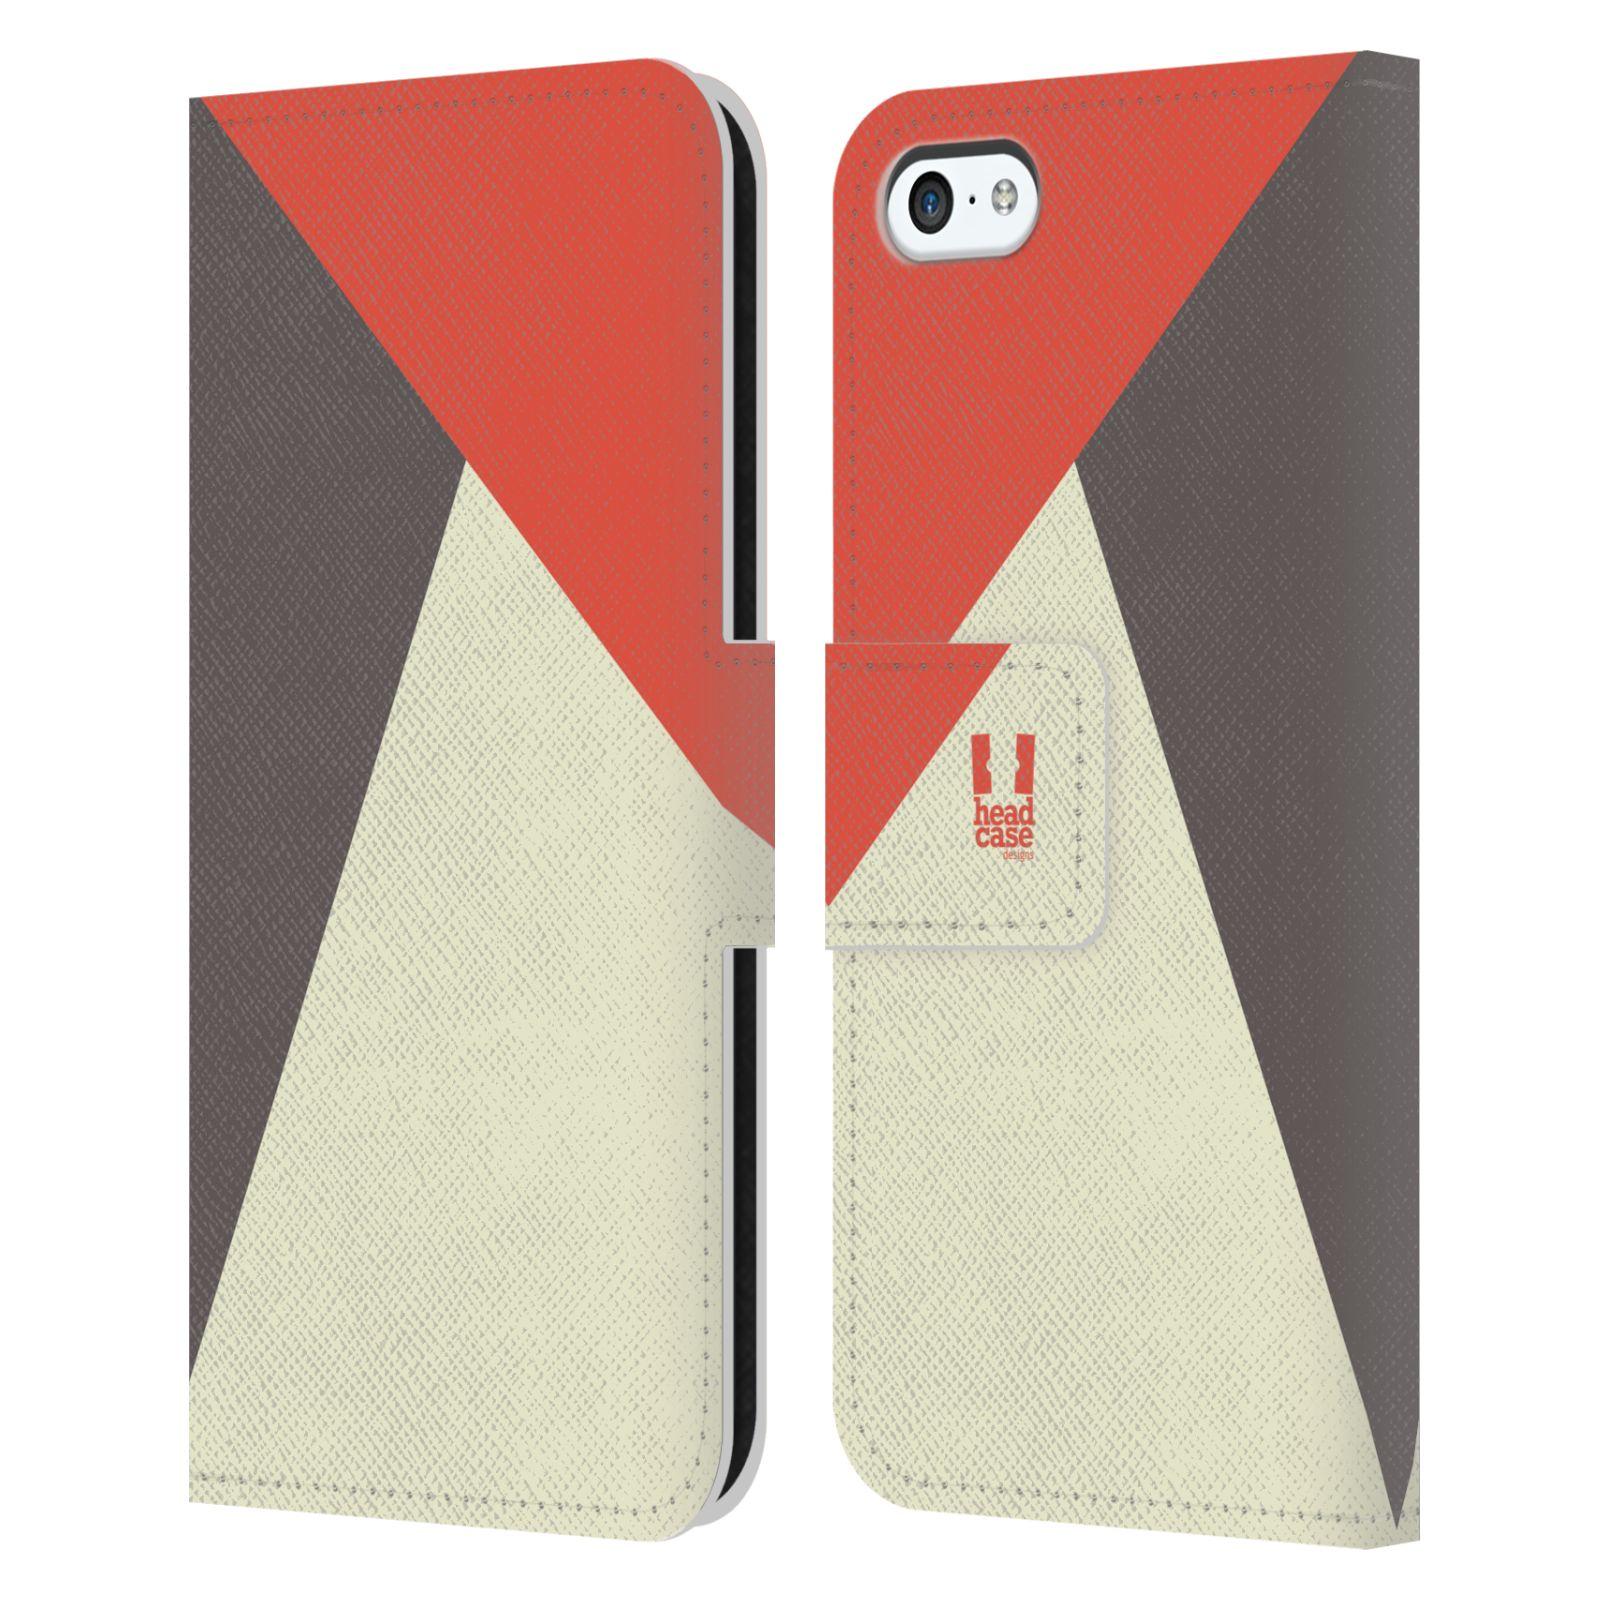 HEAD CASE Flipové pouzdro pro mobil Apple Iphone 5C barevné tvary červená a šedá COOL